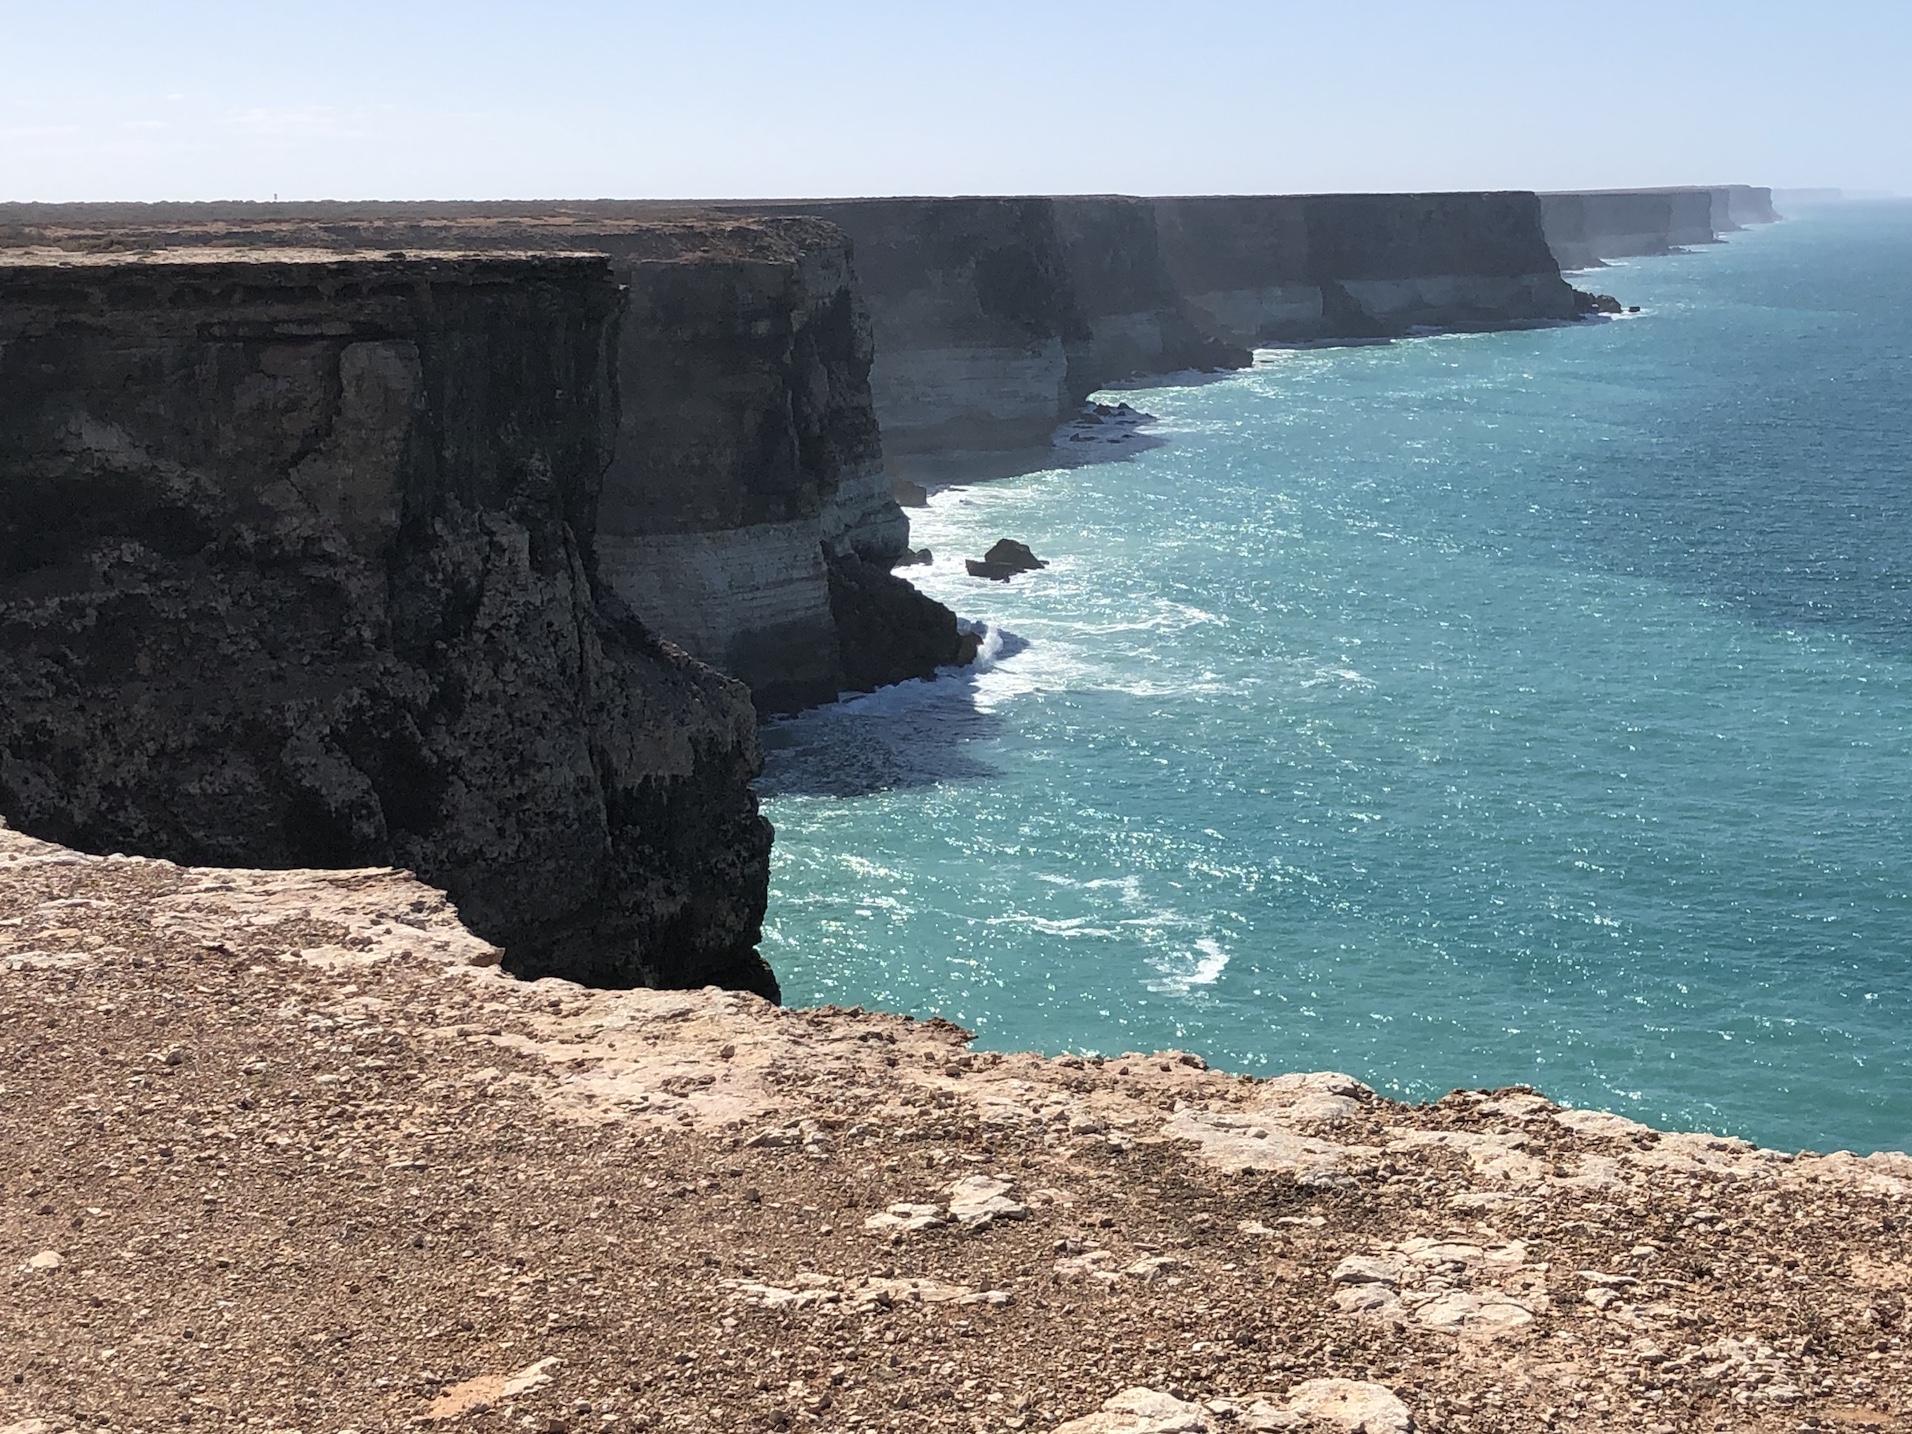 2020-03-27 Nullarbor coast, S of Eyre Highway